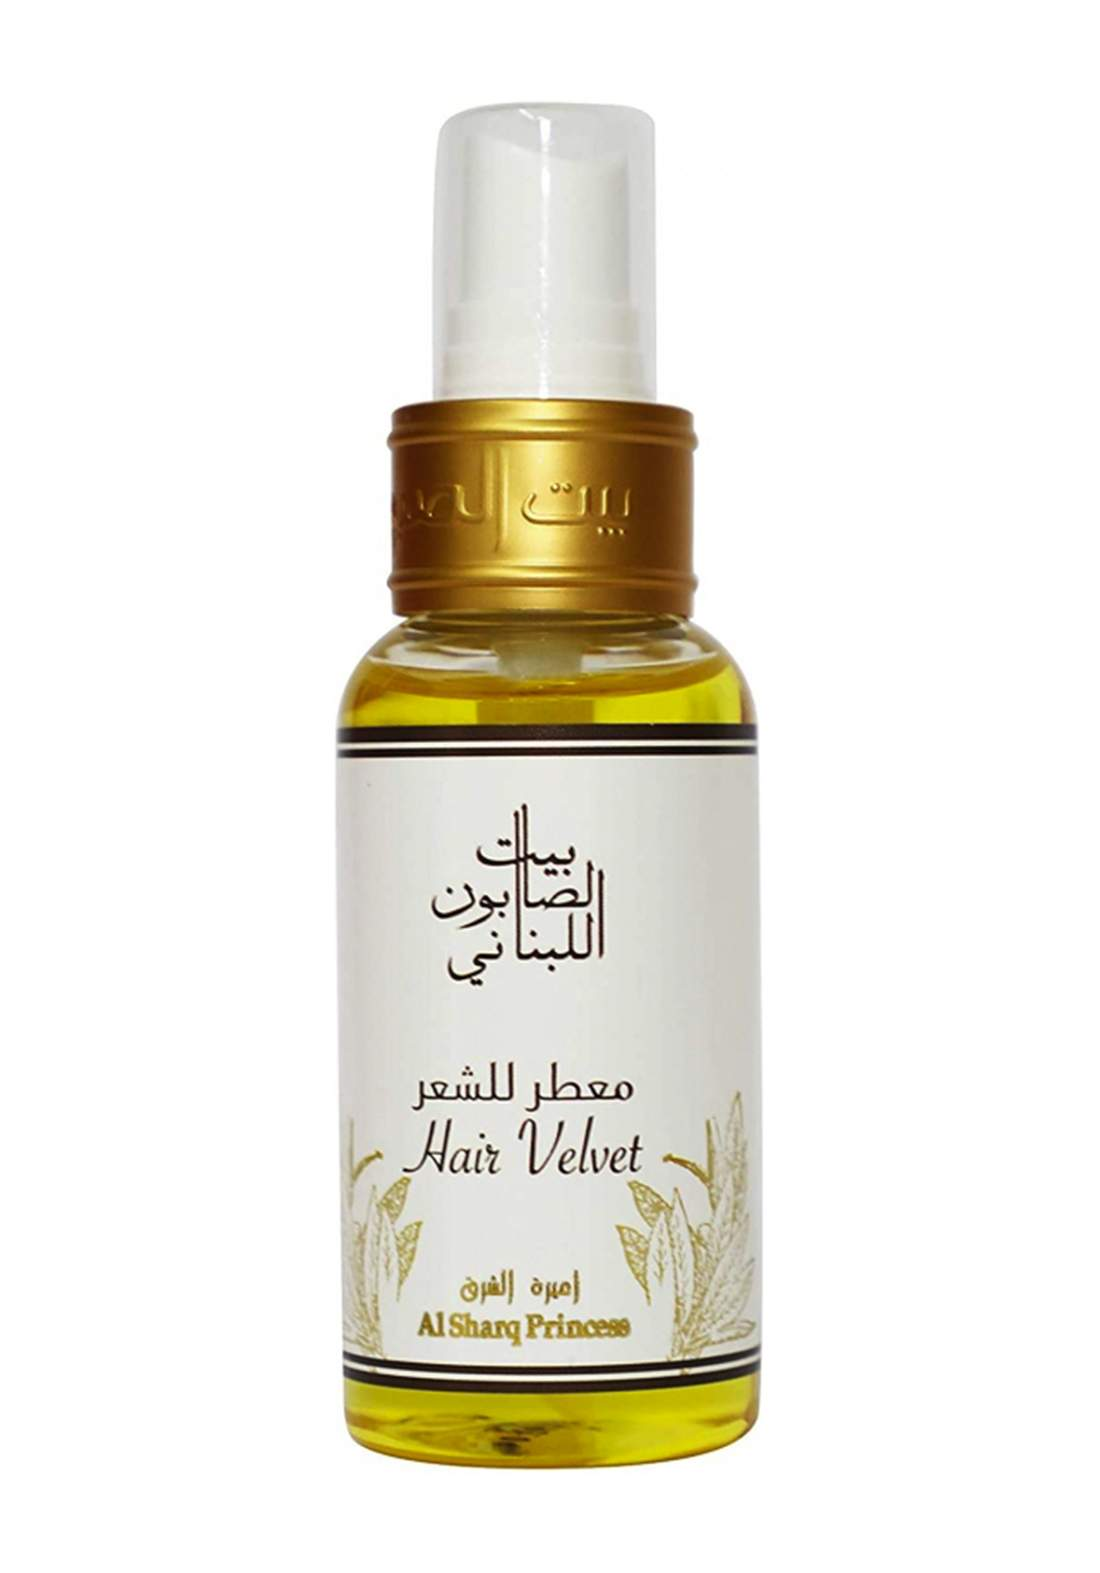 Bayt Alsaboun Alloubnani-317439 Hair Velvet Alsharq Princess 80ml معطر الشعر